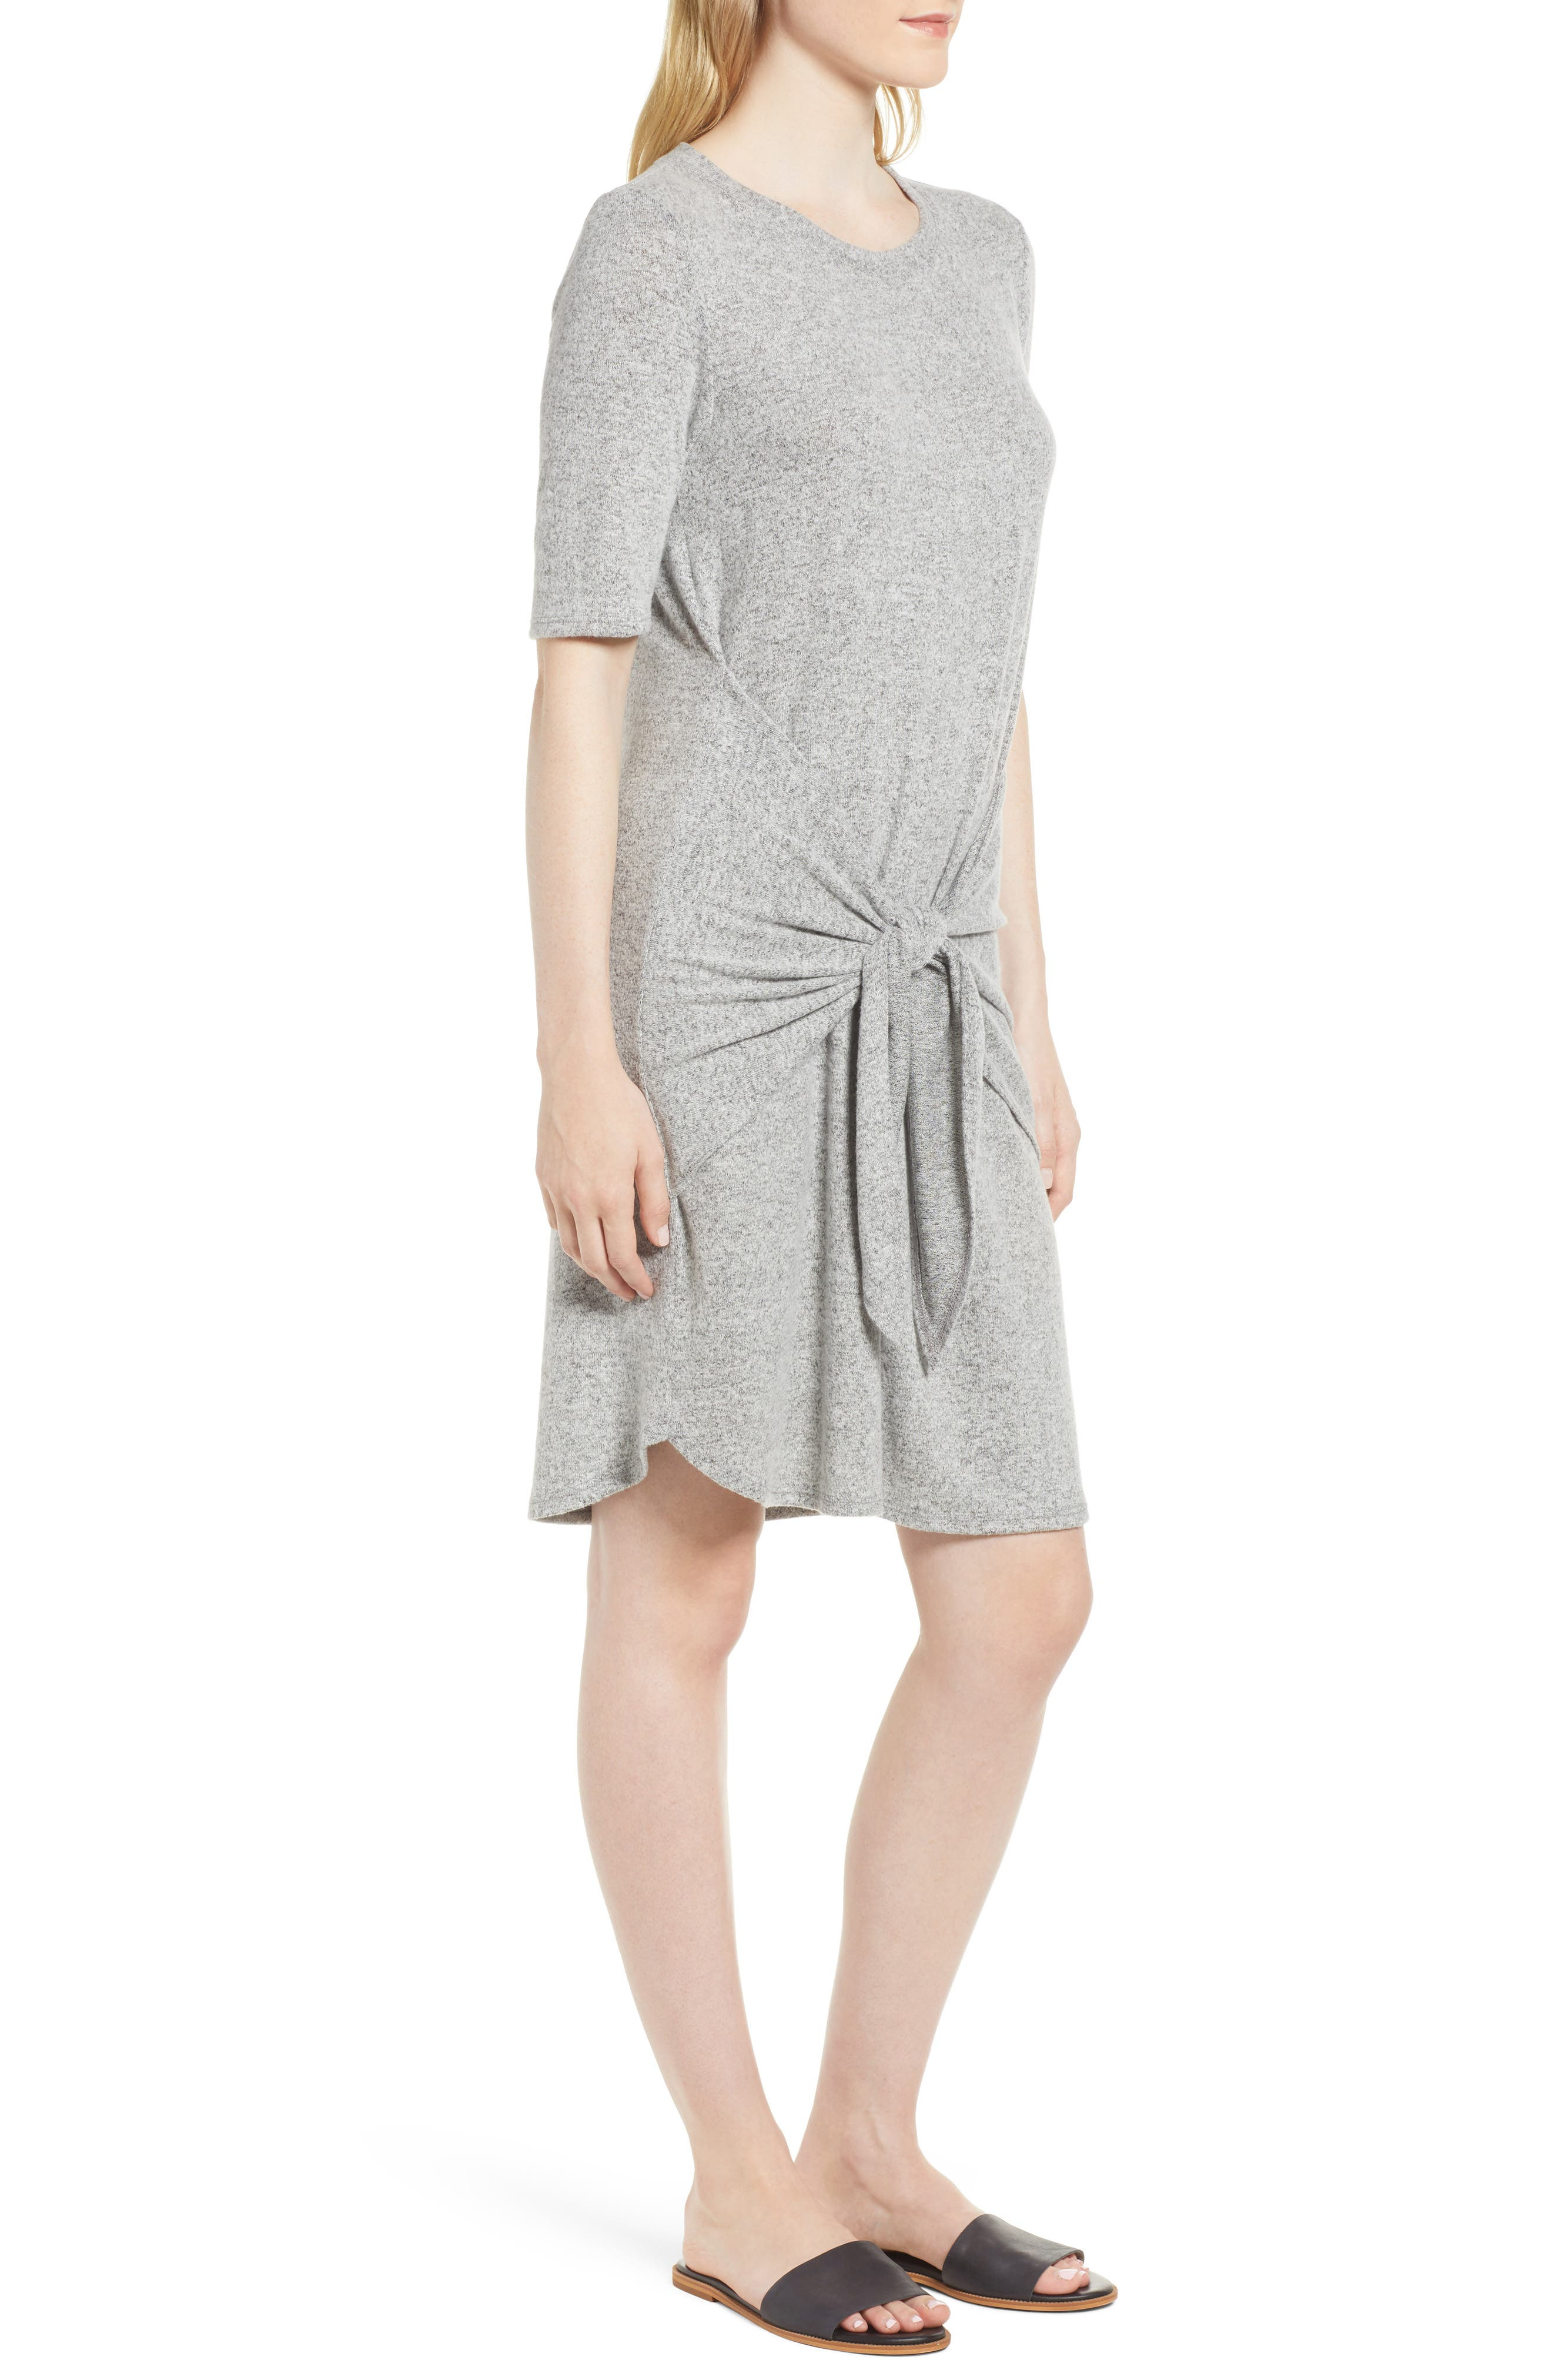 Caslon Off-Duty Tie Front Knit Dress,                             Alternate thumbnail 3, color,                             Grey Heather